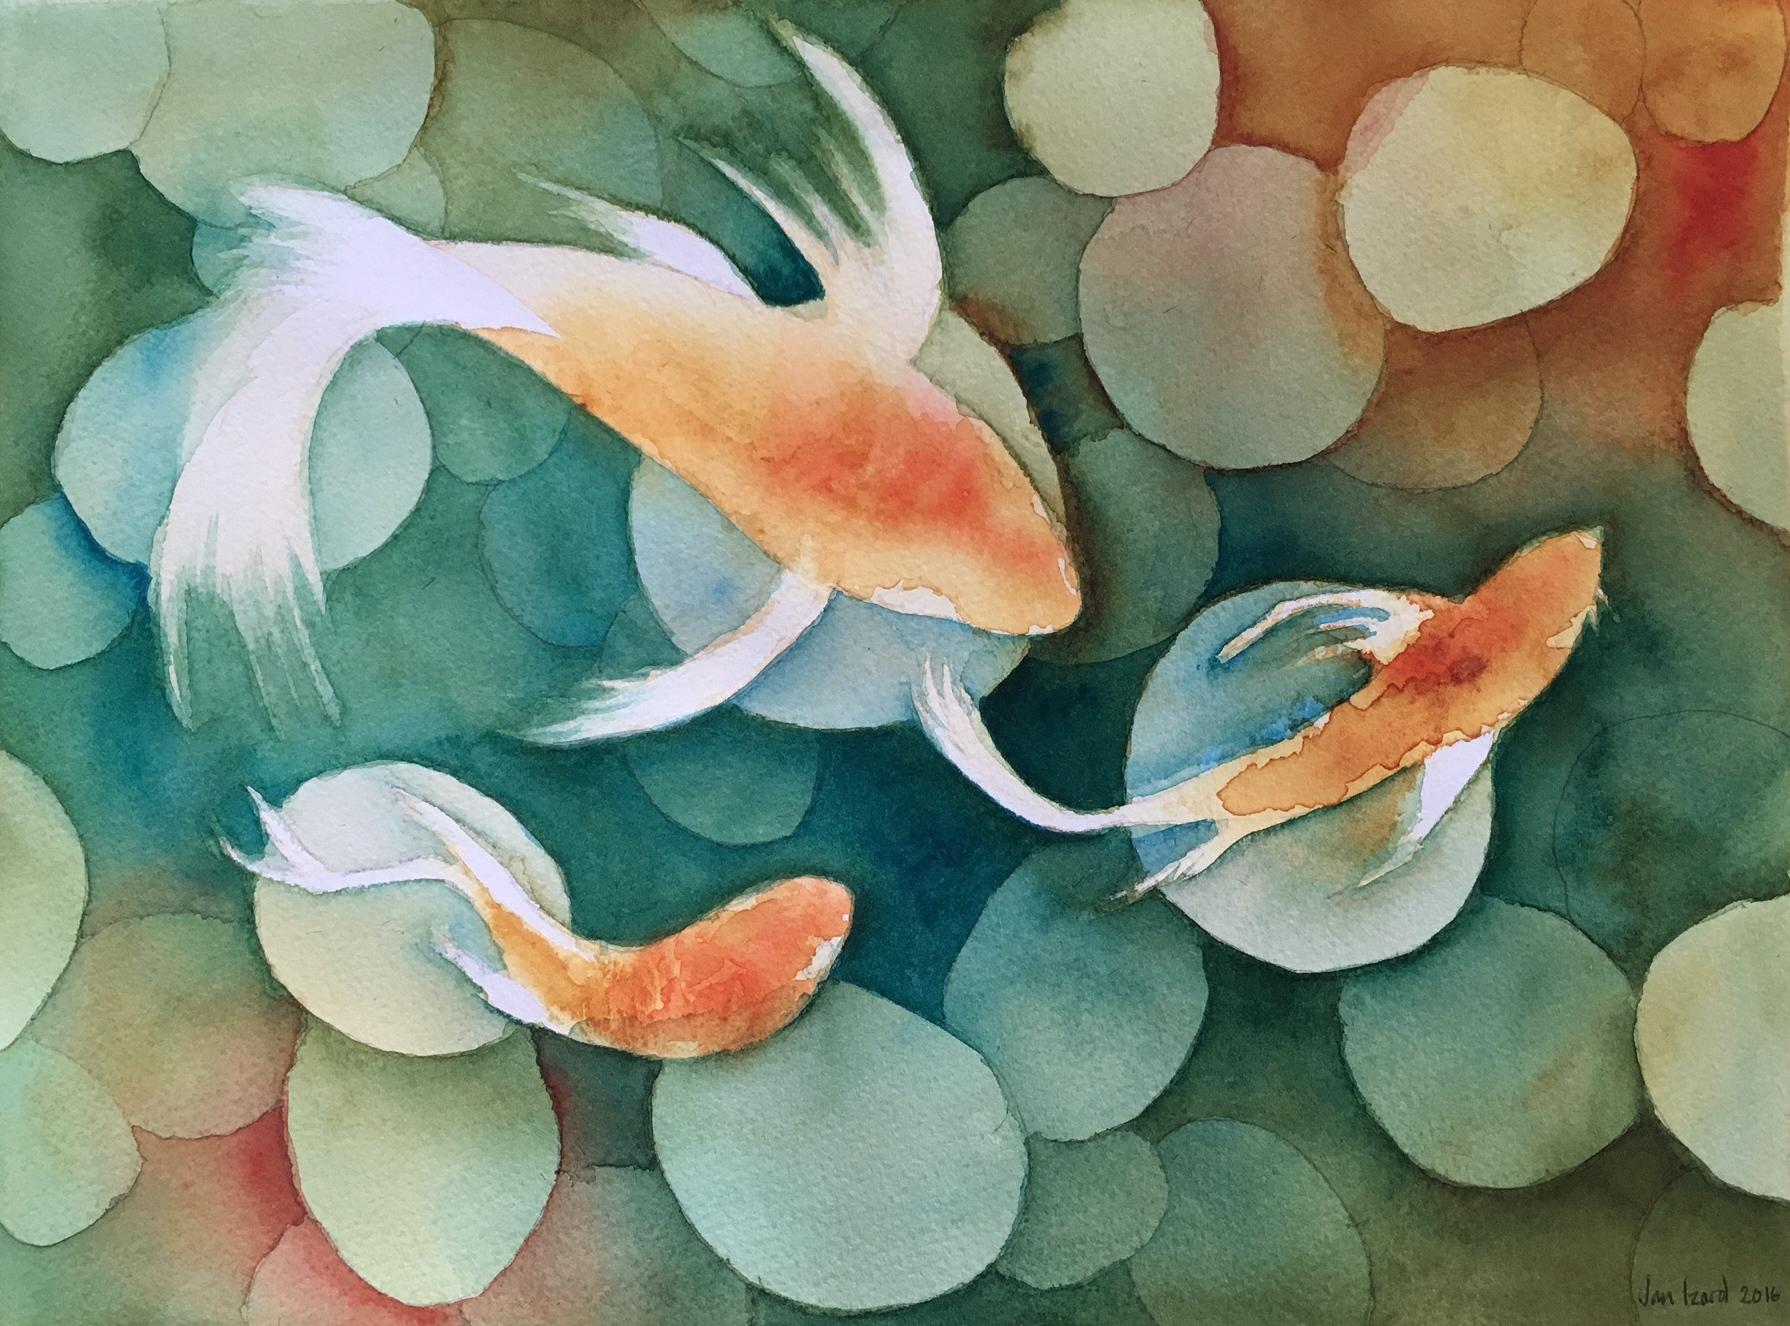 Fish & Pebbles